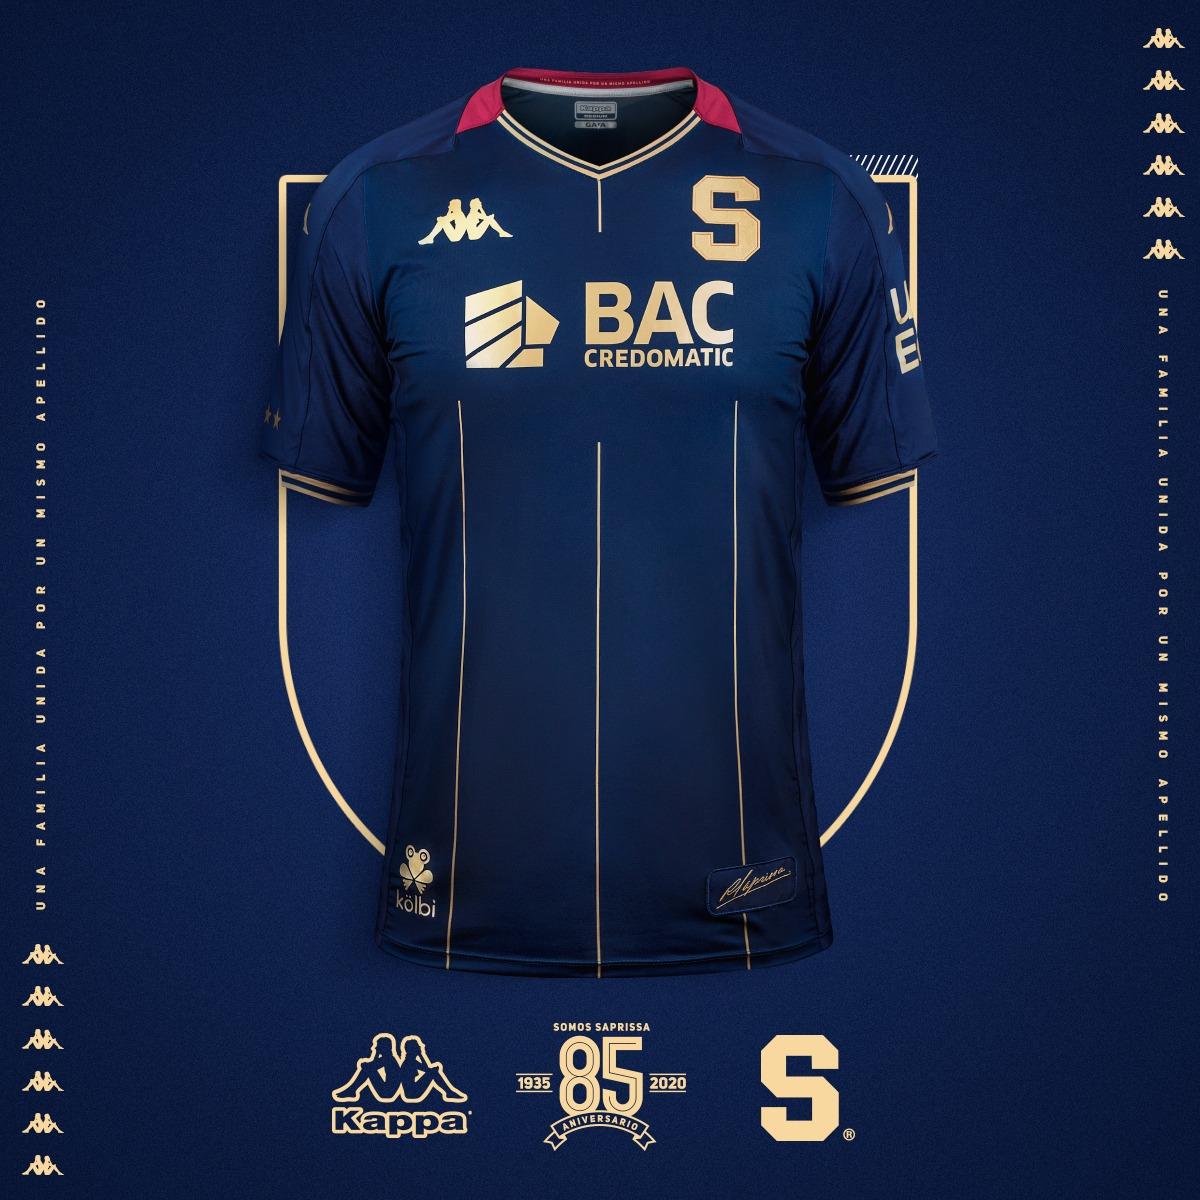 Saprissa presentó su tercera indumentaria para la temporada 2020-2021.